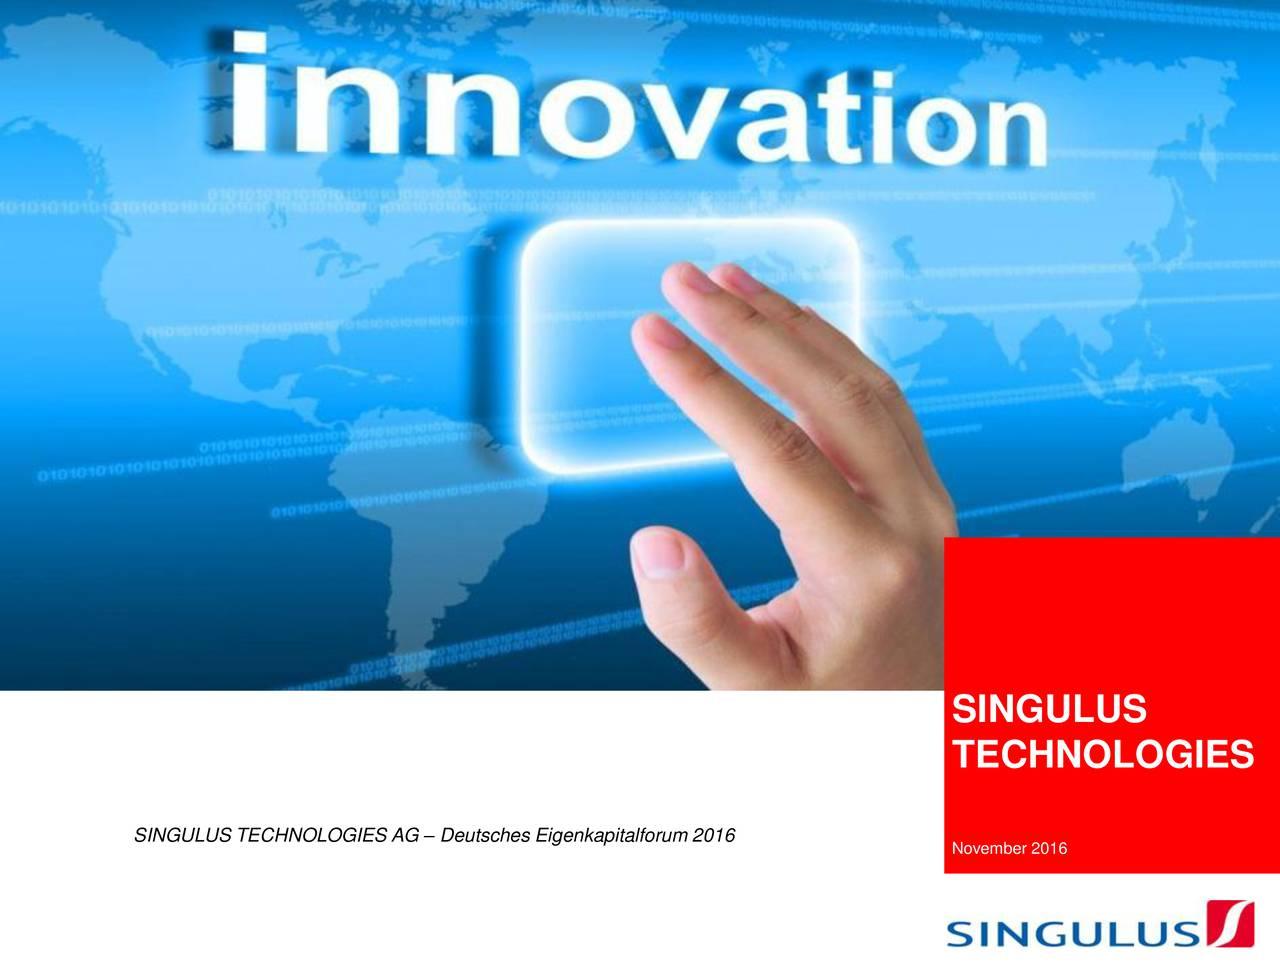 TECHNOLOGIES SINGULUS TECHNOLOGIES AG  Deutsches Eigenkapitalforum 2016 November 2016